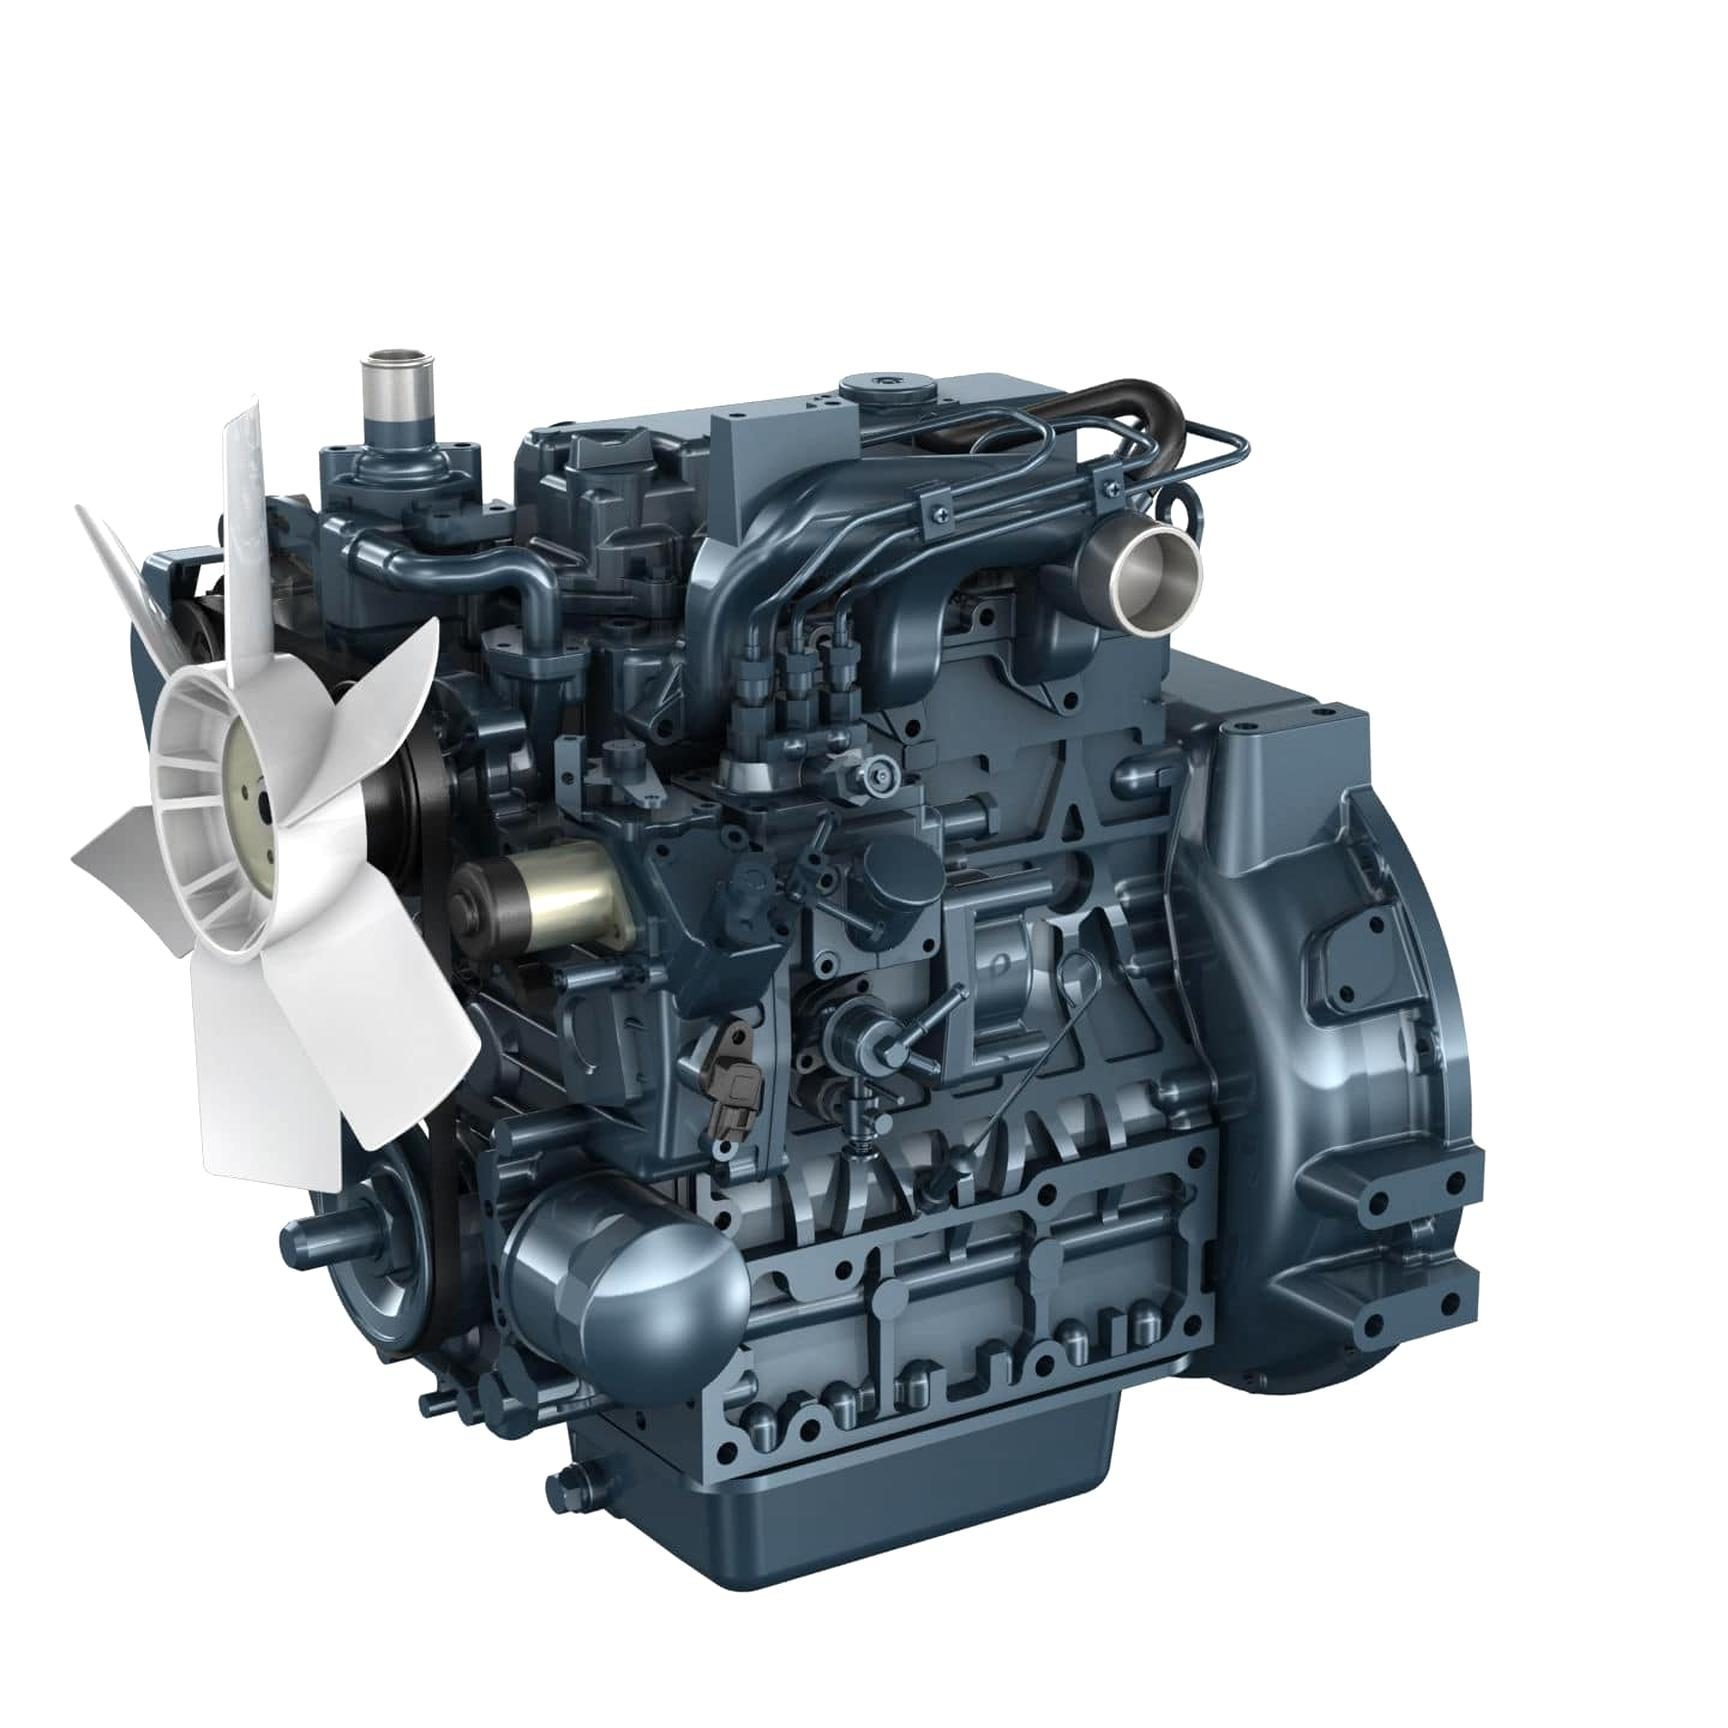 moteur kubota 3 cylindres diesel d'occasion